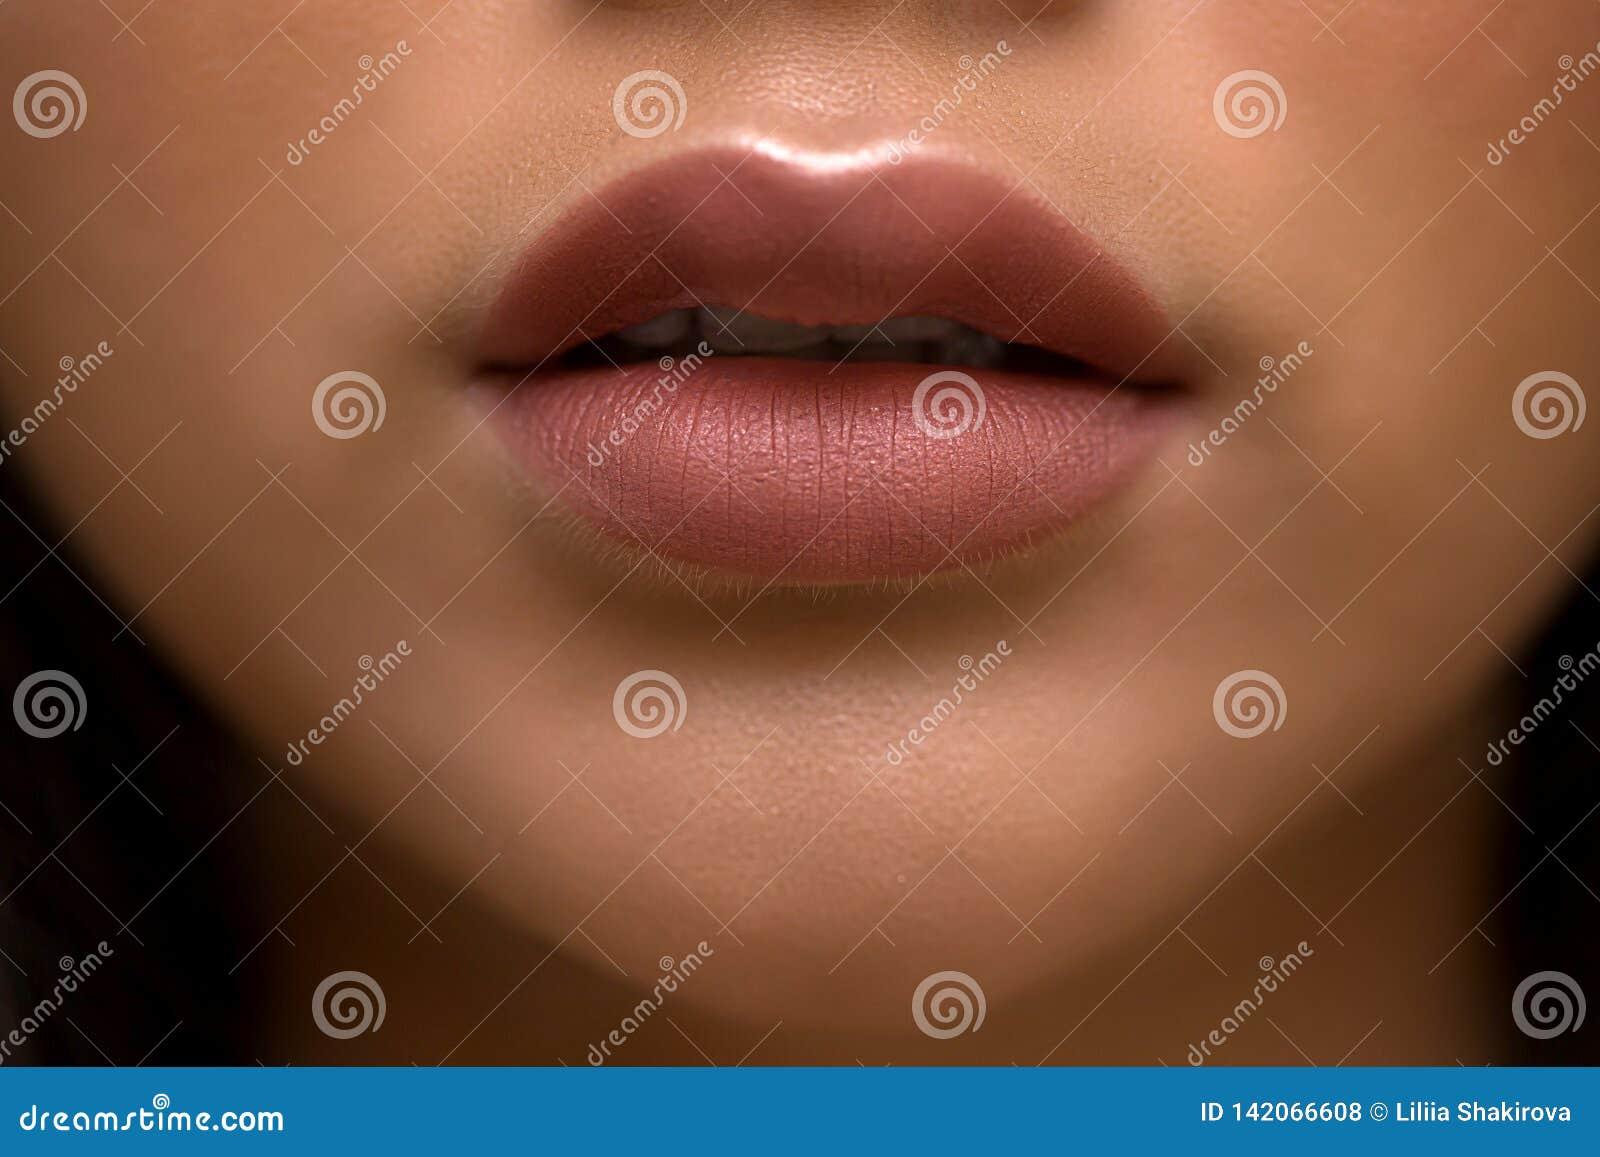 Cosmetics, makeup, is lipstick, a Nude shade, light brown gloss, close-up, half open lips, clean skin girls